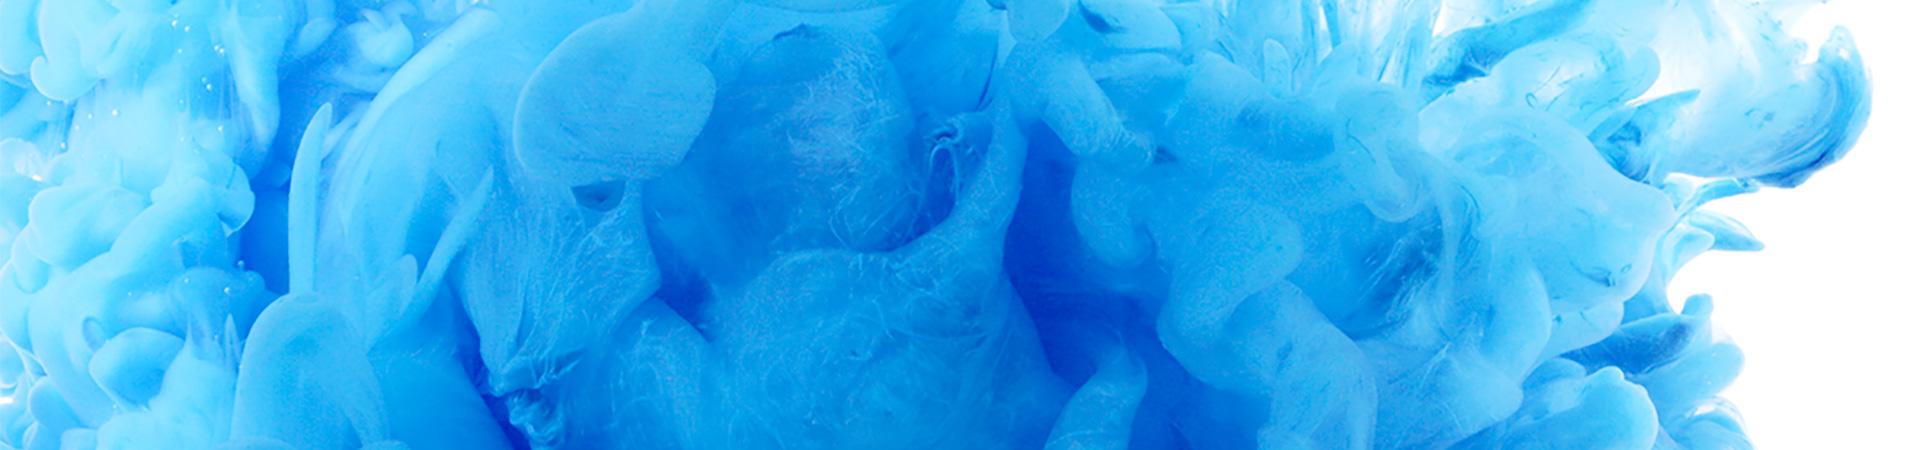 Blue colour splash illustration